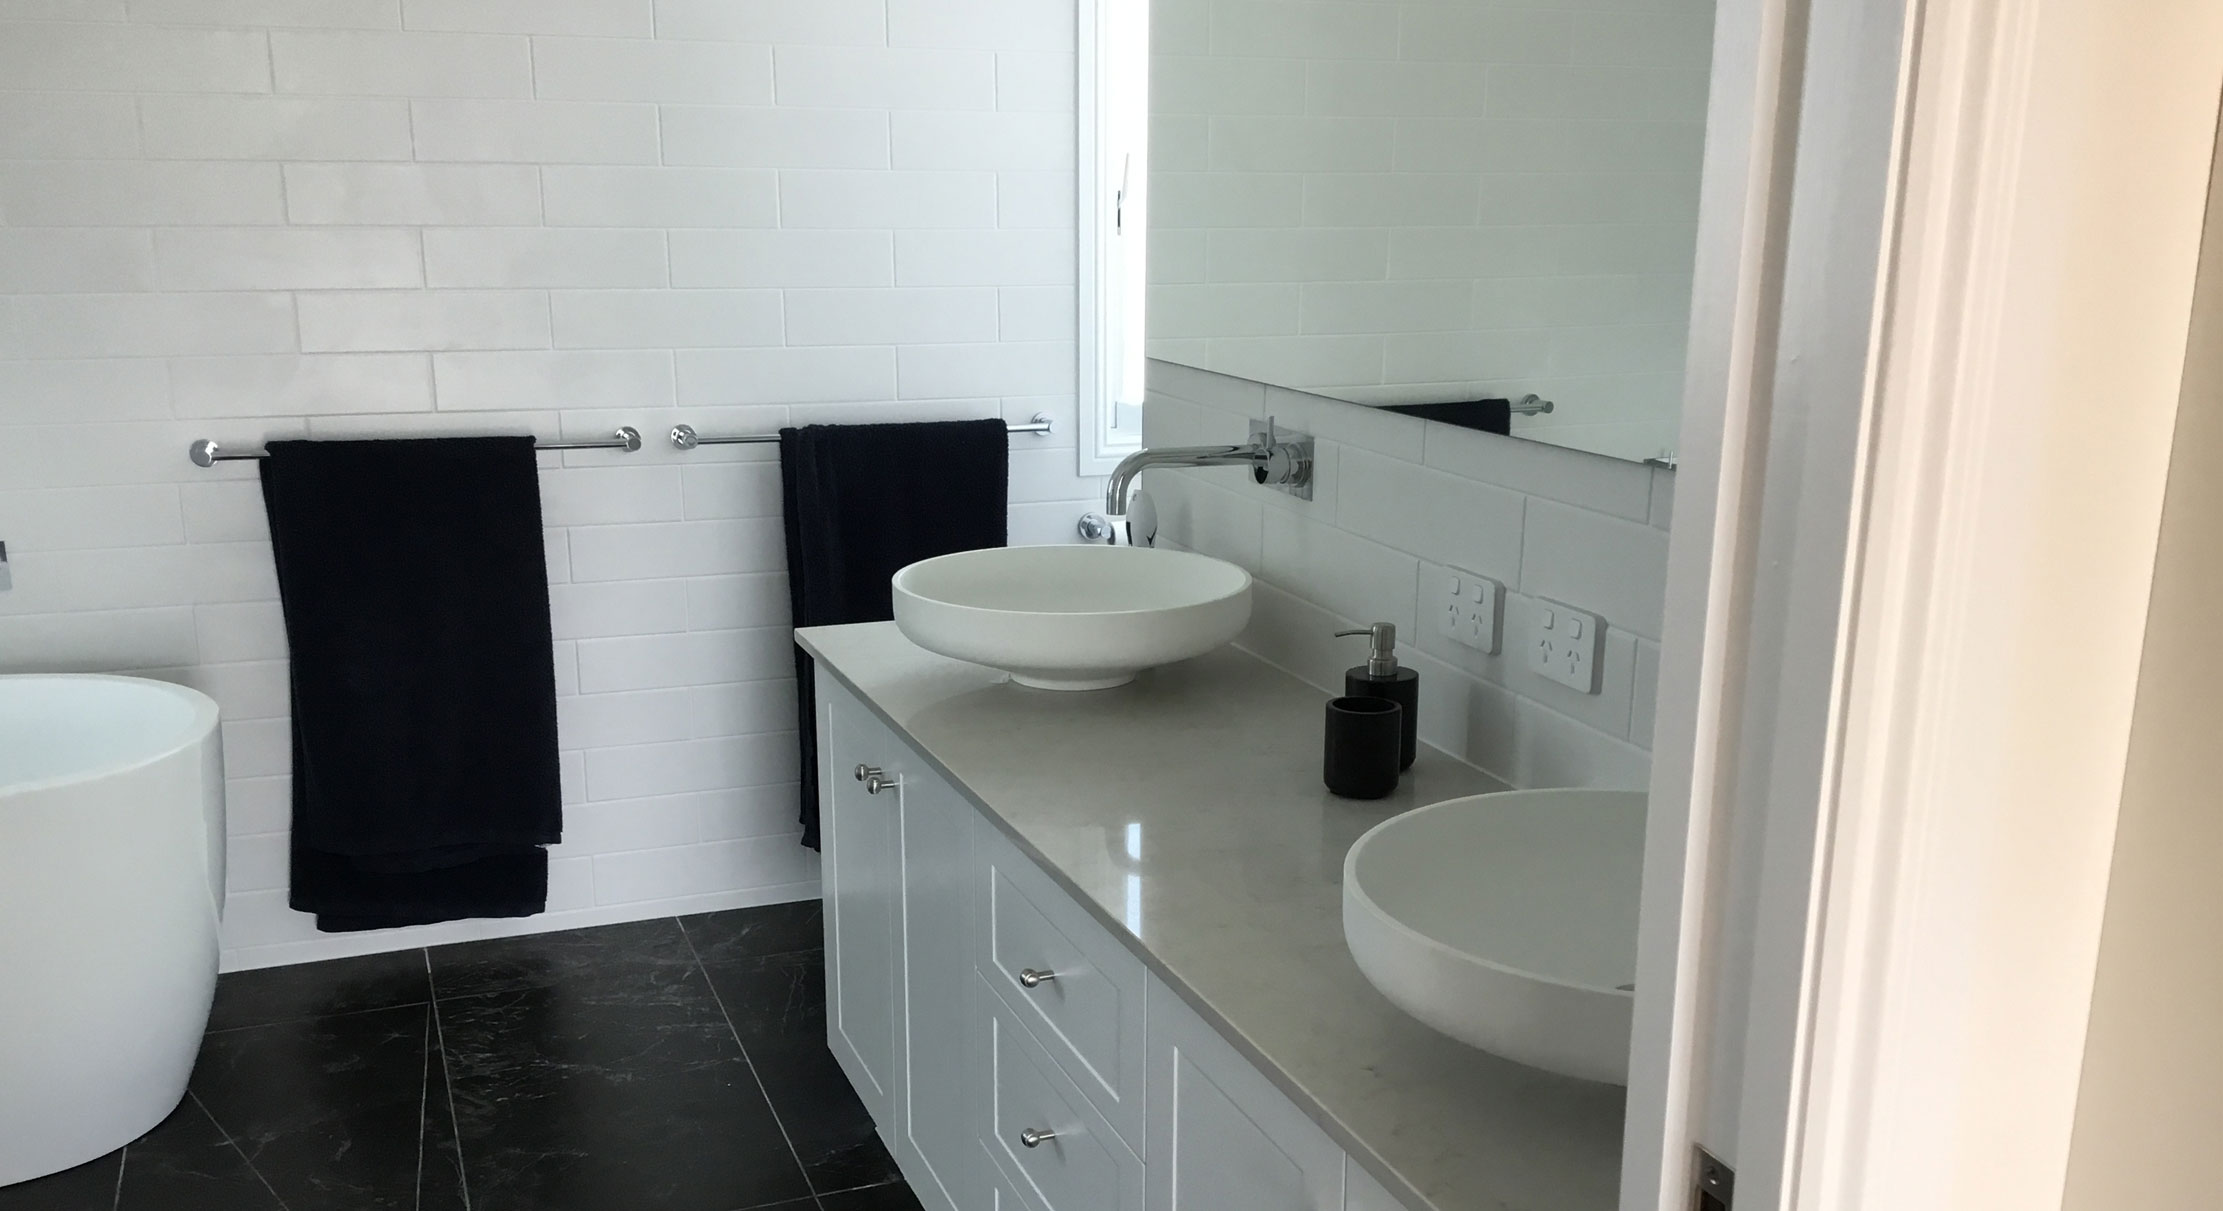 portfolio-5-slider-image-4-bathroom-norman-park-gary-cramb-constructions-brisbane